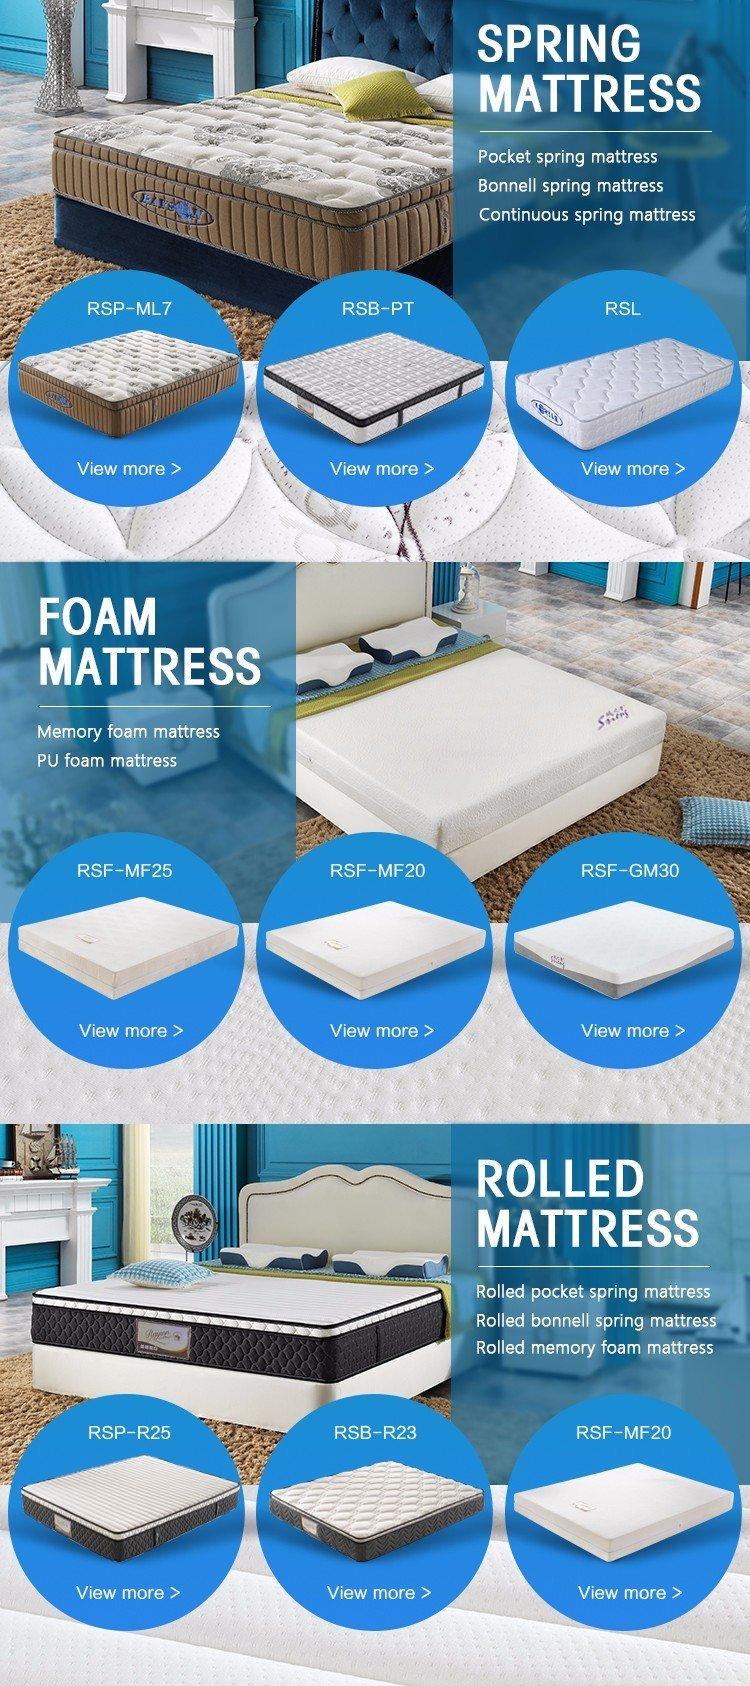 Cheaper Good Quality Mattress Gel Memory Foam Mattresses